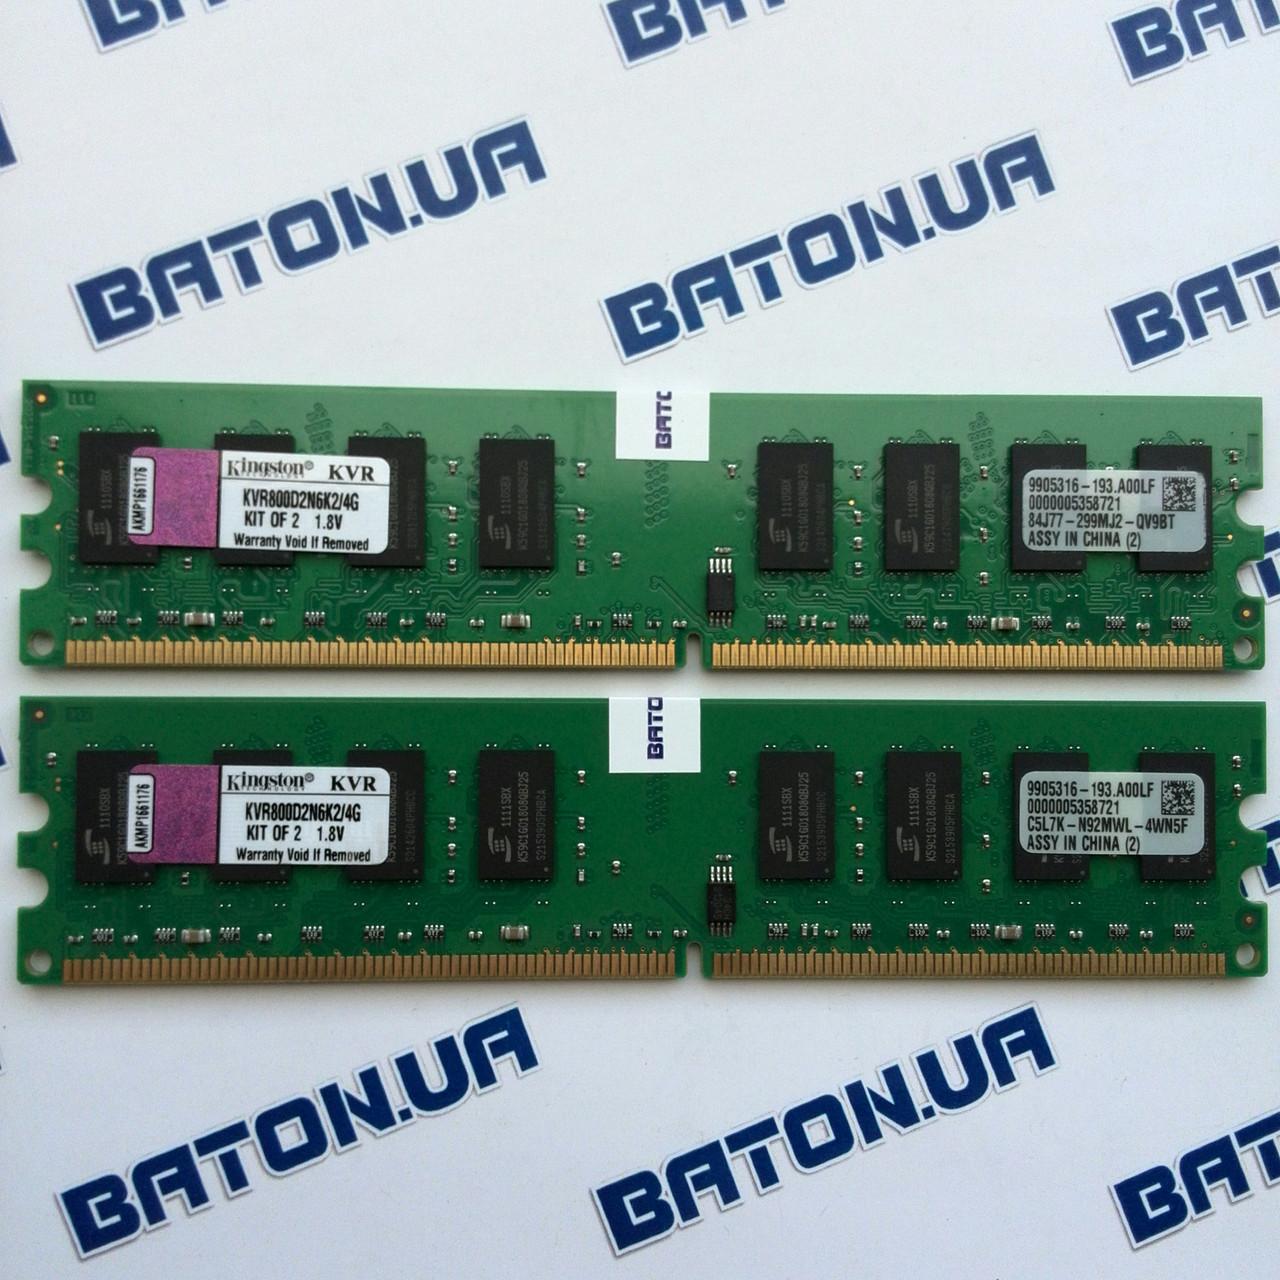 Оперативная память Kingston DDR2 4Gb KIT of 2 800MHz PC2 6400U CL6 (KVR800D2N6K2/4G)